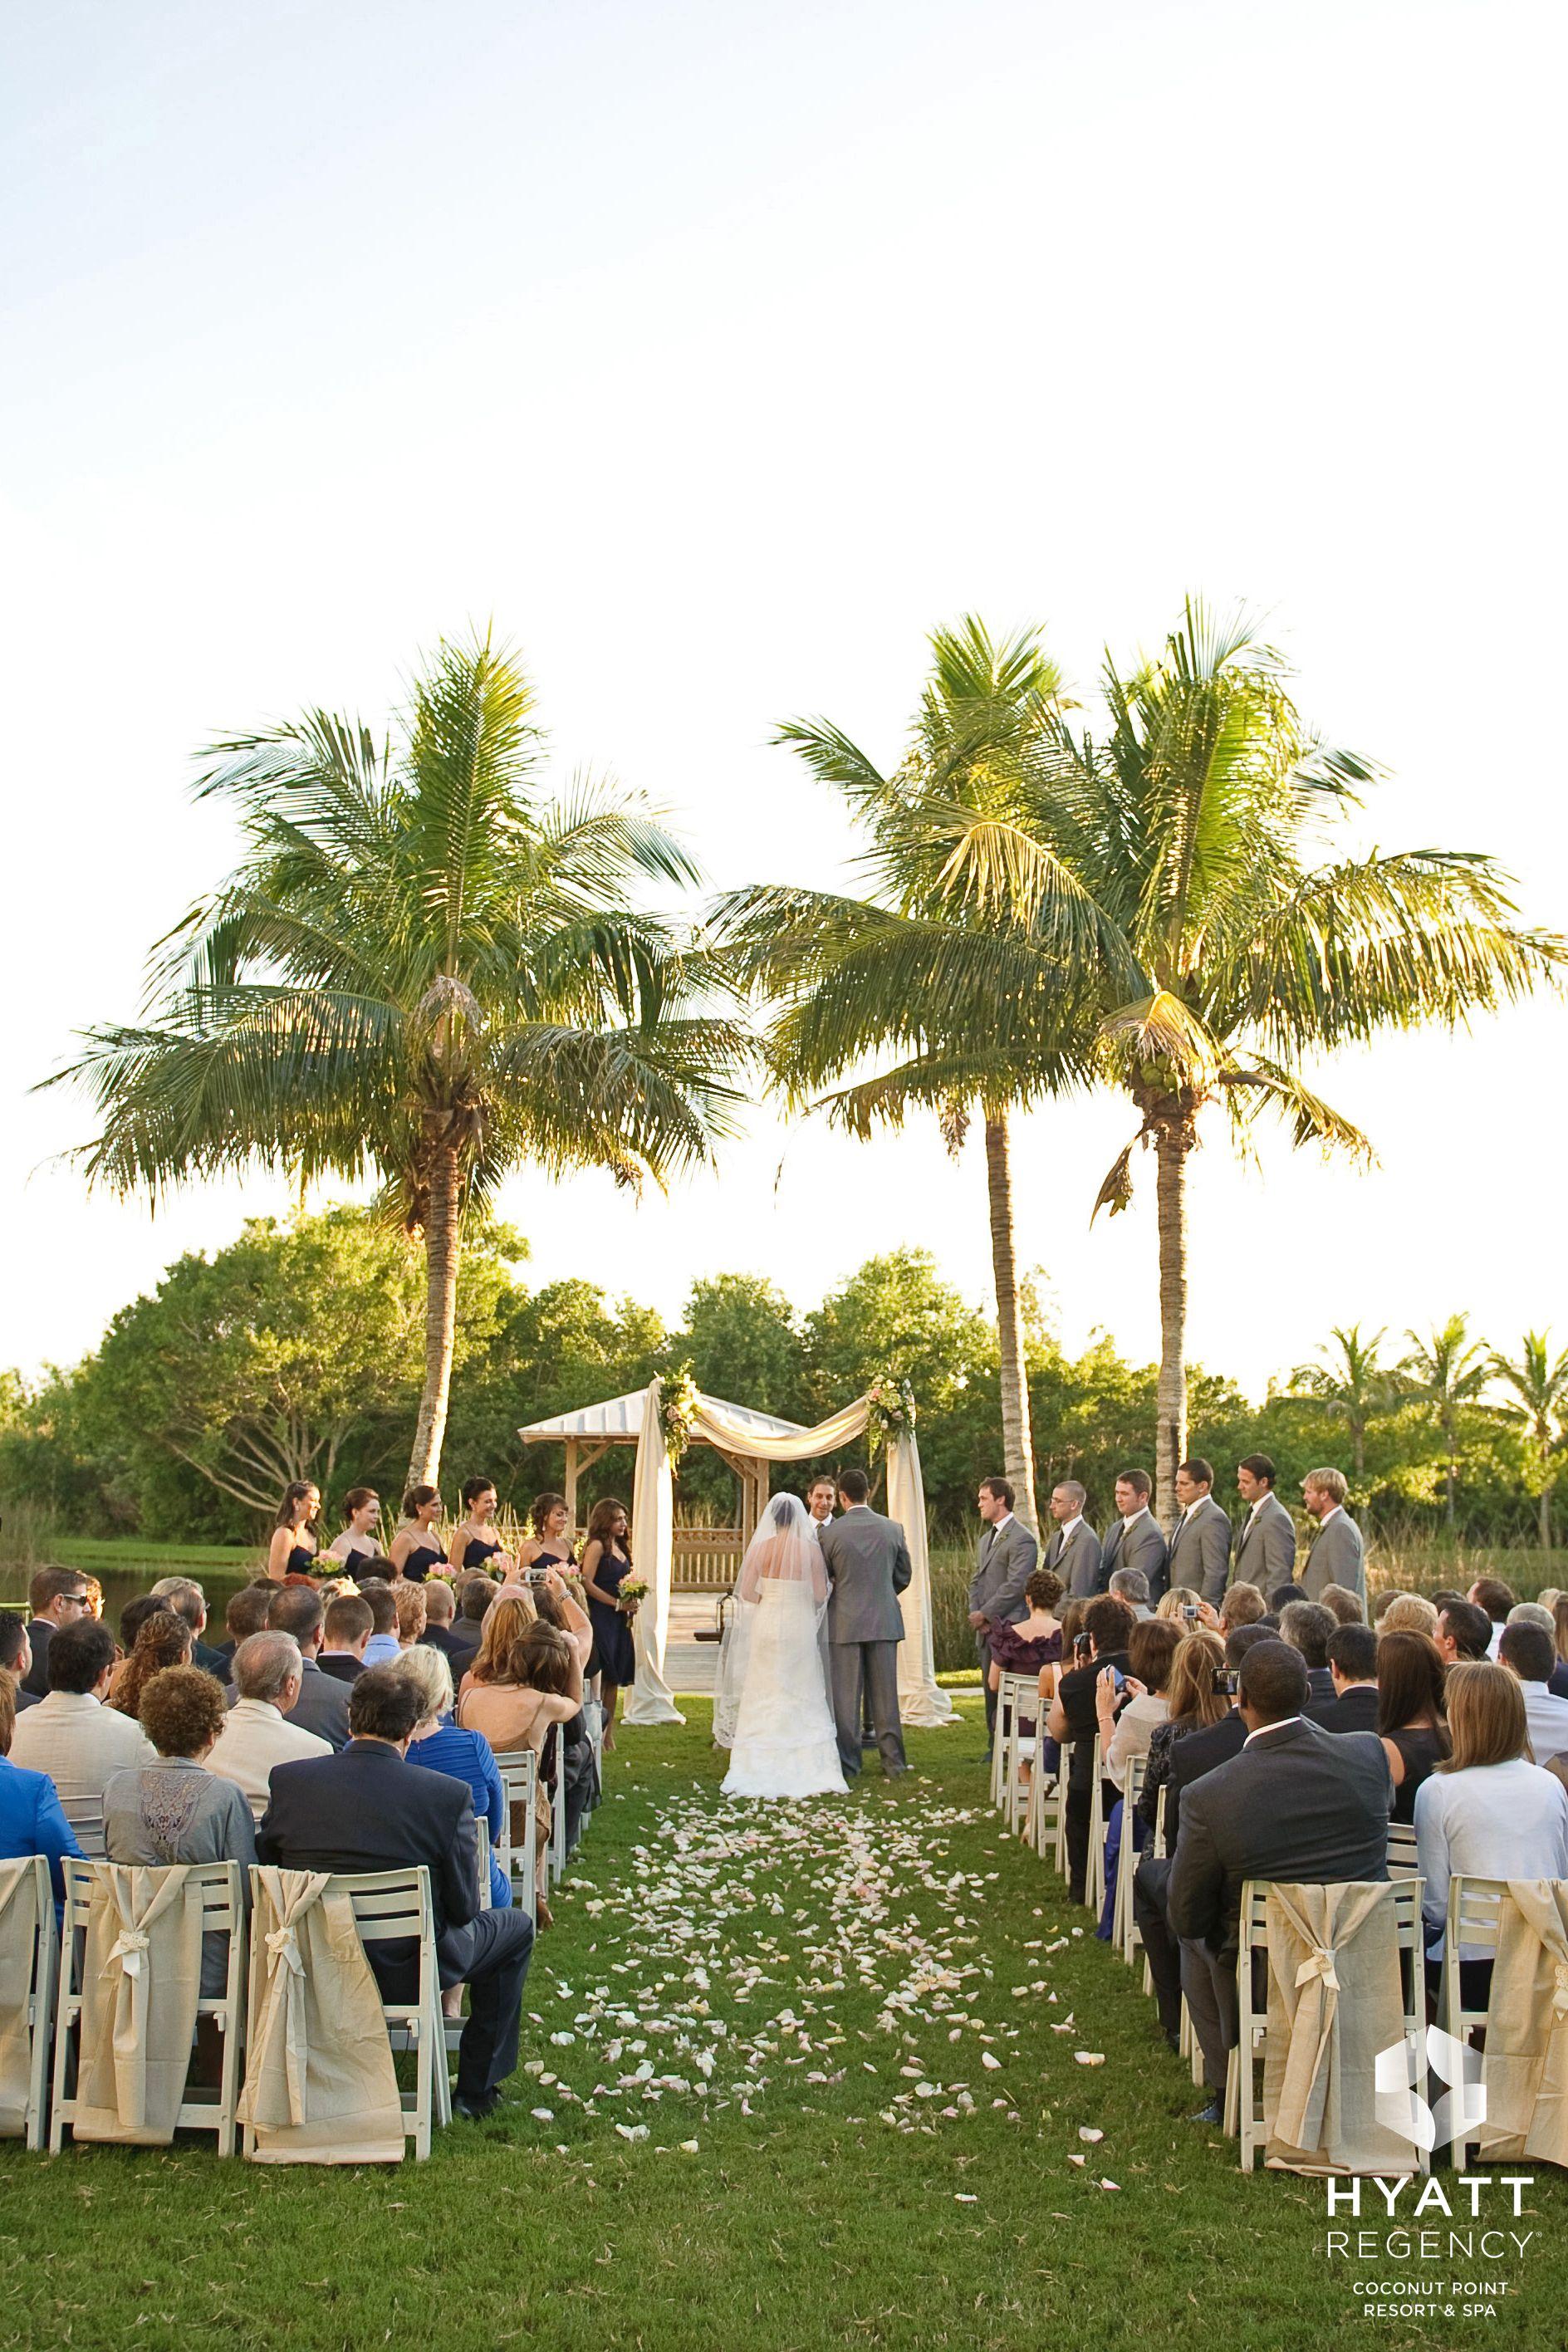 Tropical outdoor wedding on Cypress Courtyard Hyatt Regency Coconut